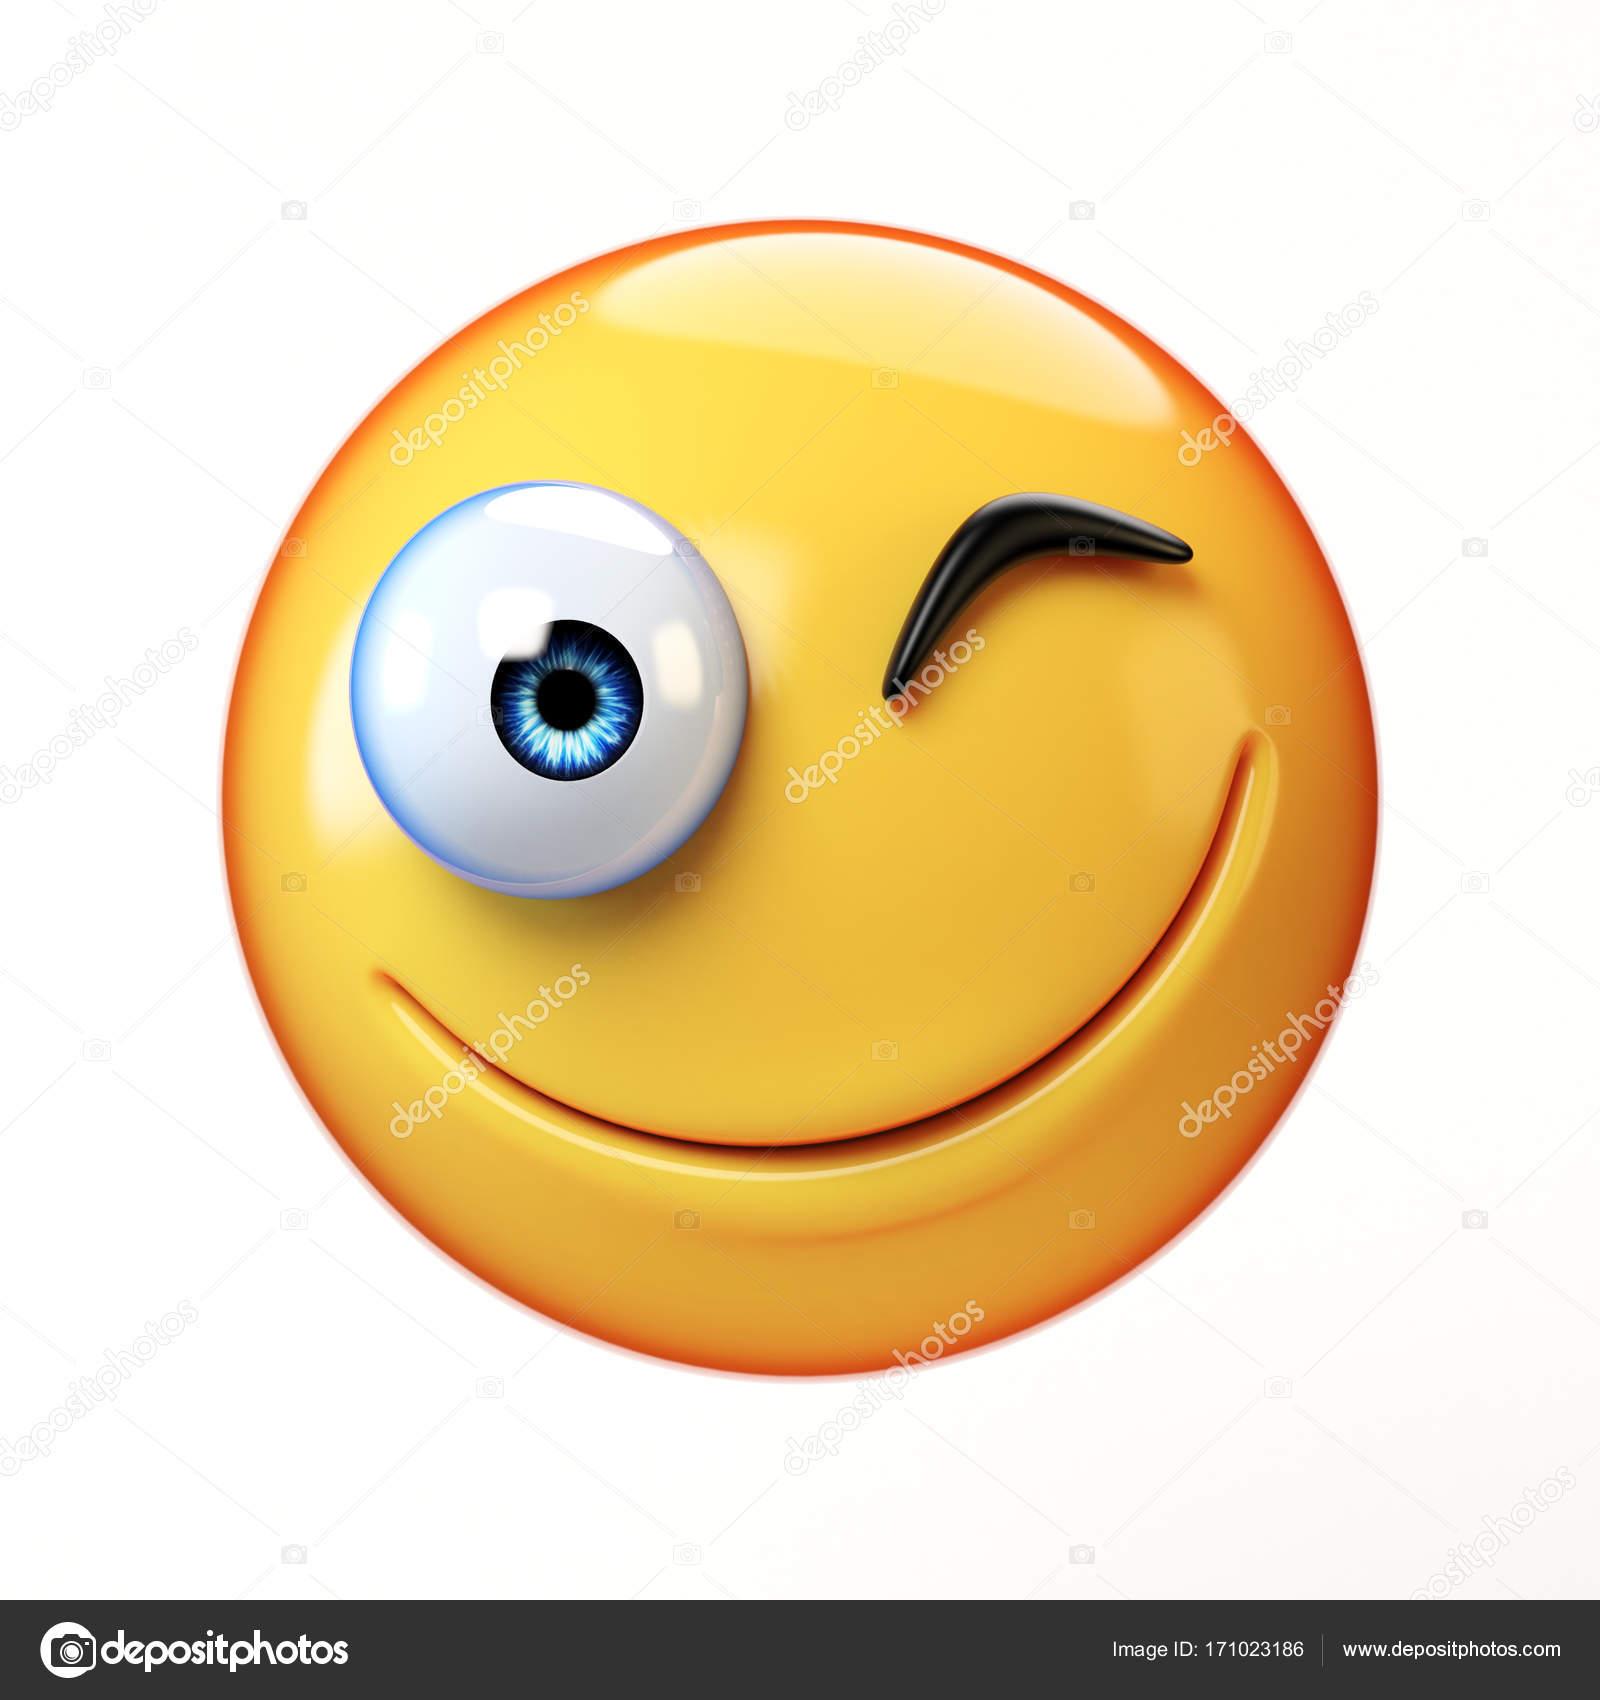 Winking Emoji Isolated On White Background Smiling Face Emoticon 3d